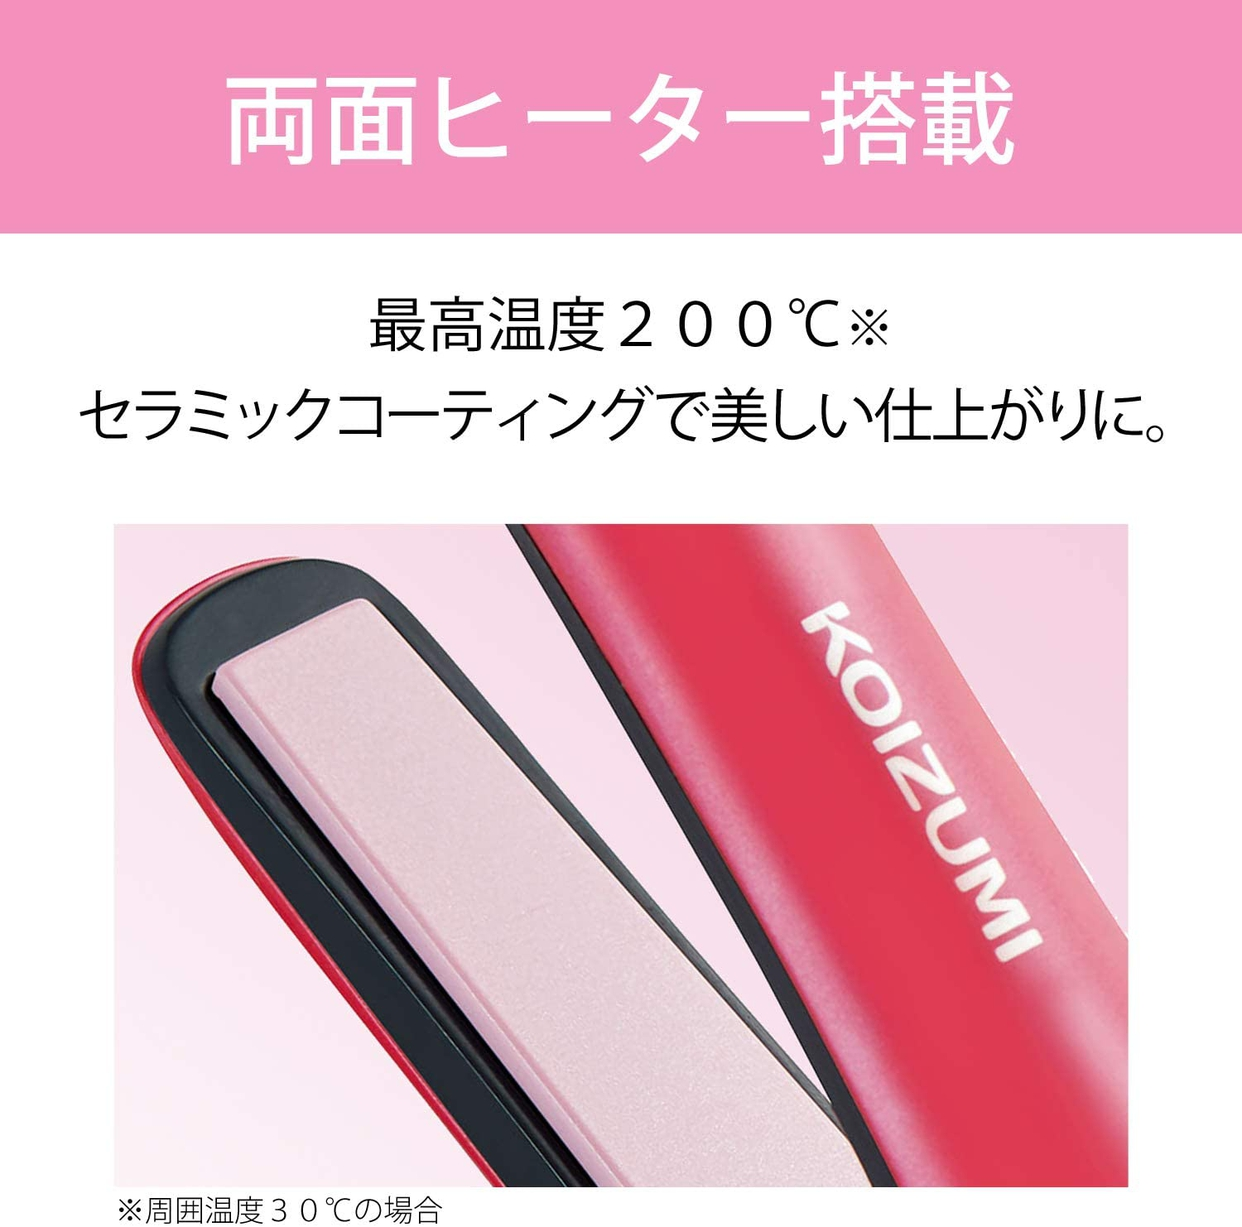 KOIZUMI(コイズミ) コードレスストレートアイロン KHS-8620の商品画像3